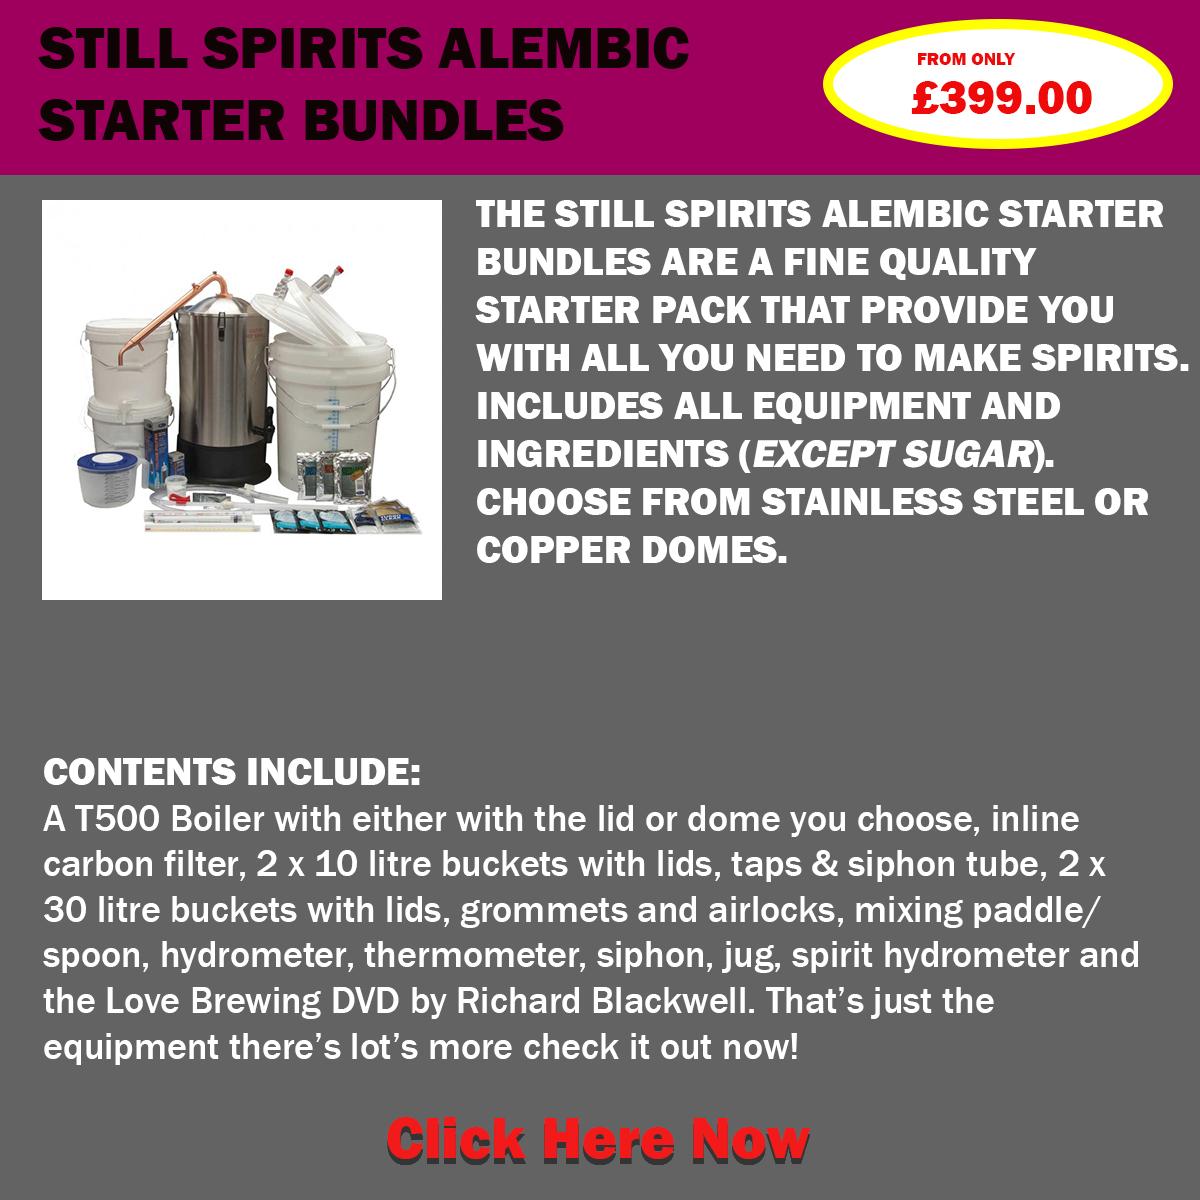 subcat_still_spirits_alembic_starter_bundles3